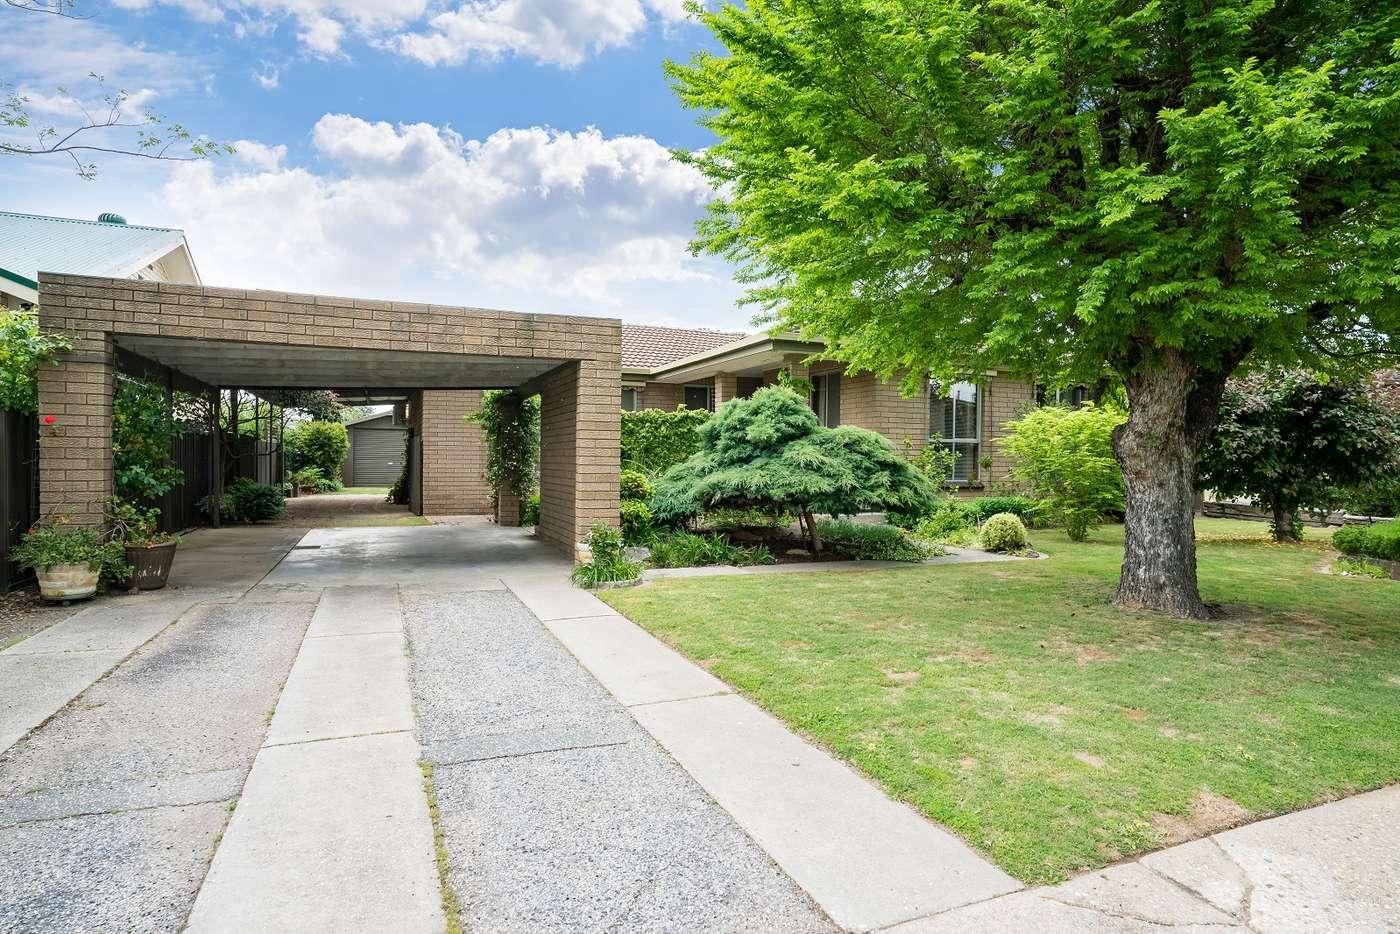 Main view of Homely house listing, 8 Glenairne Street, Wodonga VIC 3690